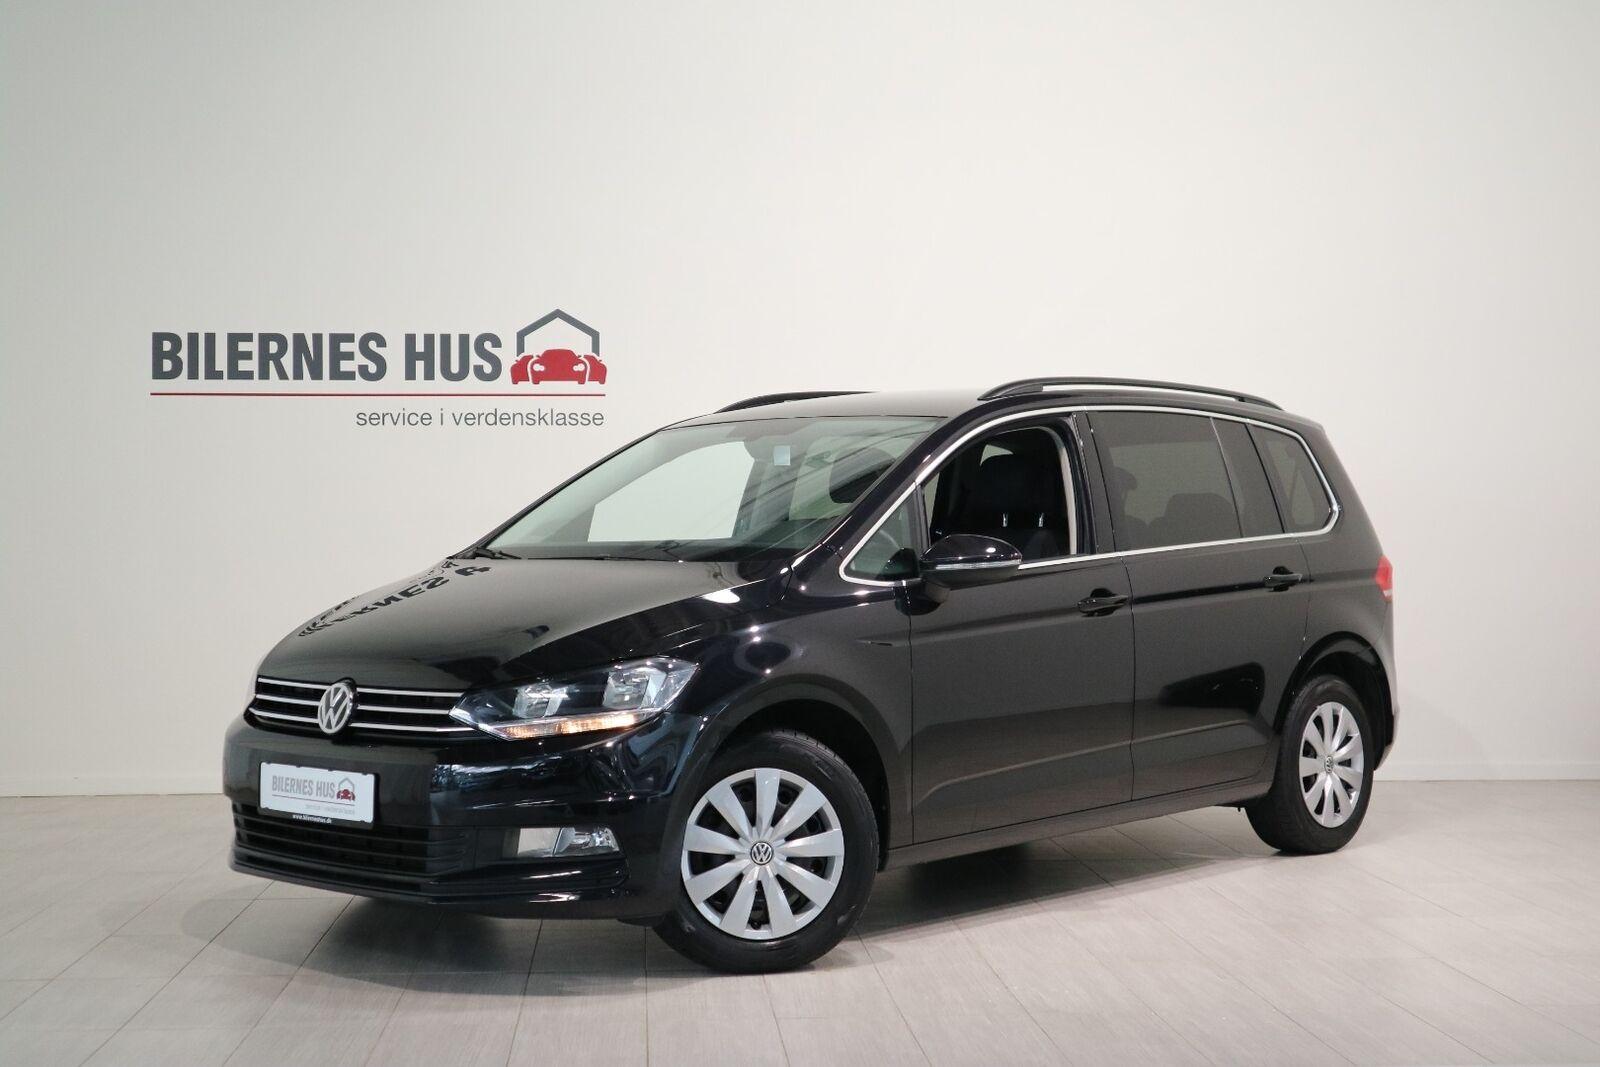 VW Touran Billede 0